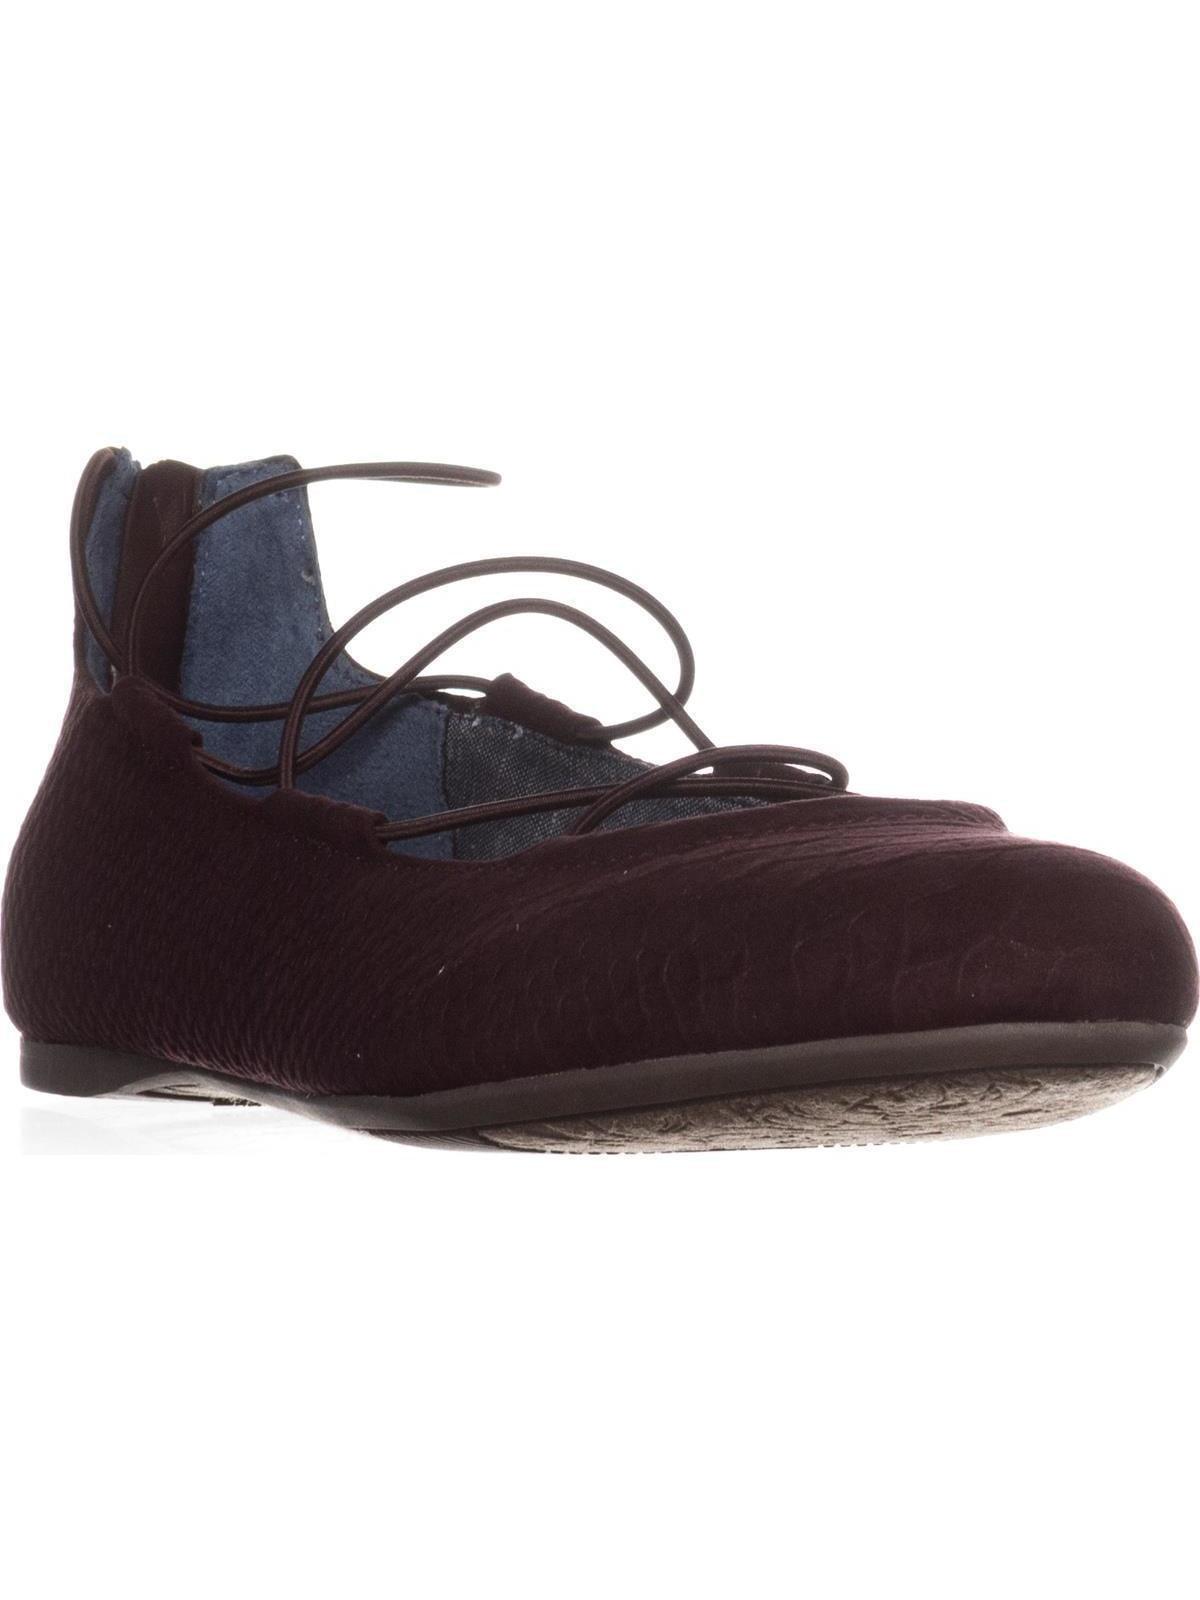 Dr. Scholl s Shoes - Dr. Scholl s Shoes Women s Glory Flat - Walmart.com 43692c66fa6